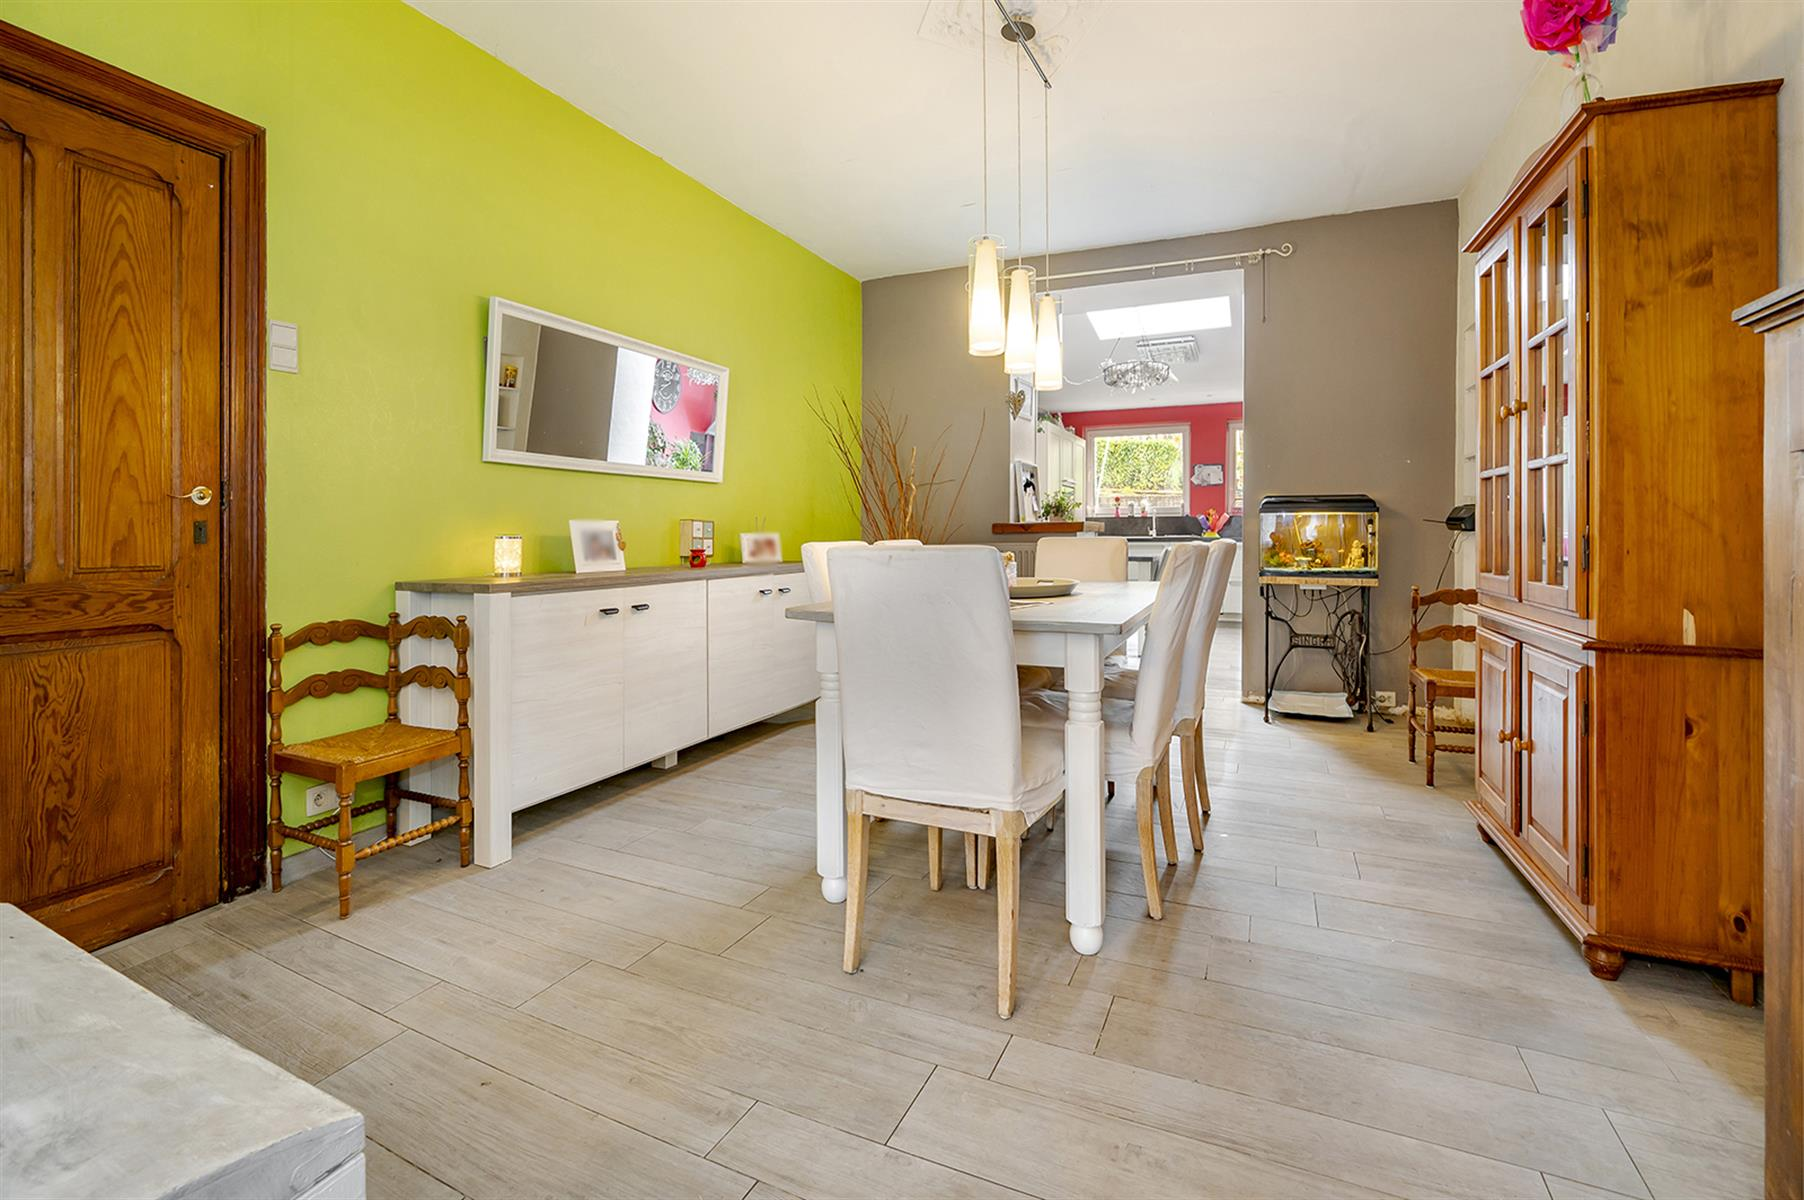 Maison - Oreye - #4174883-0